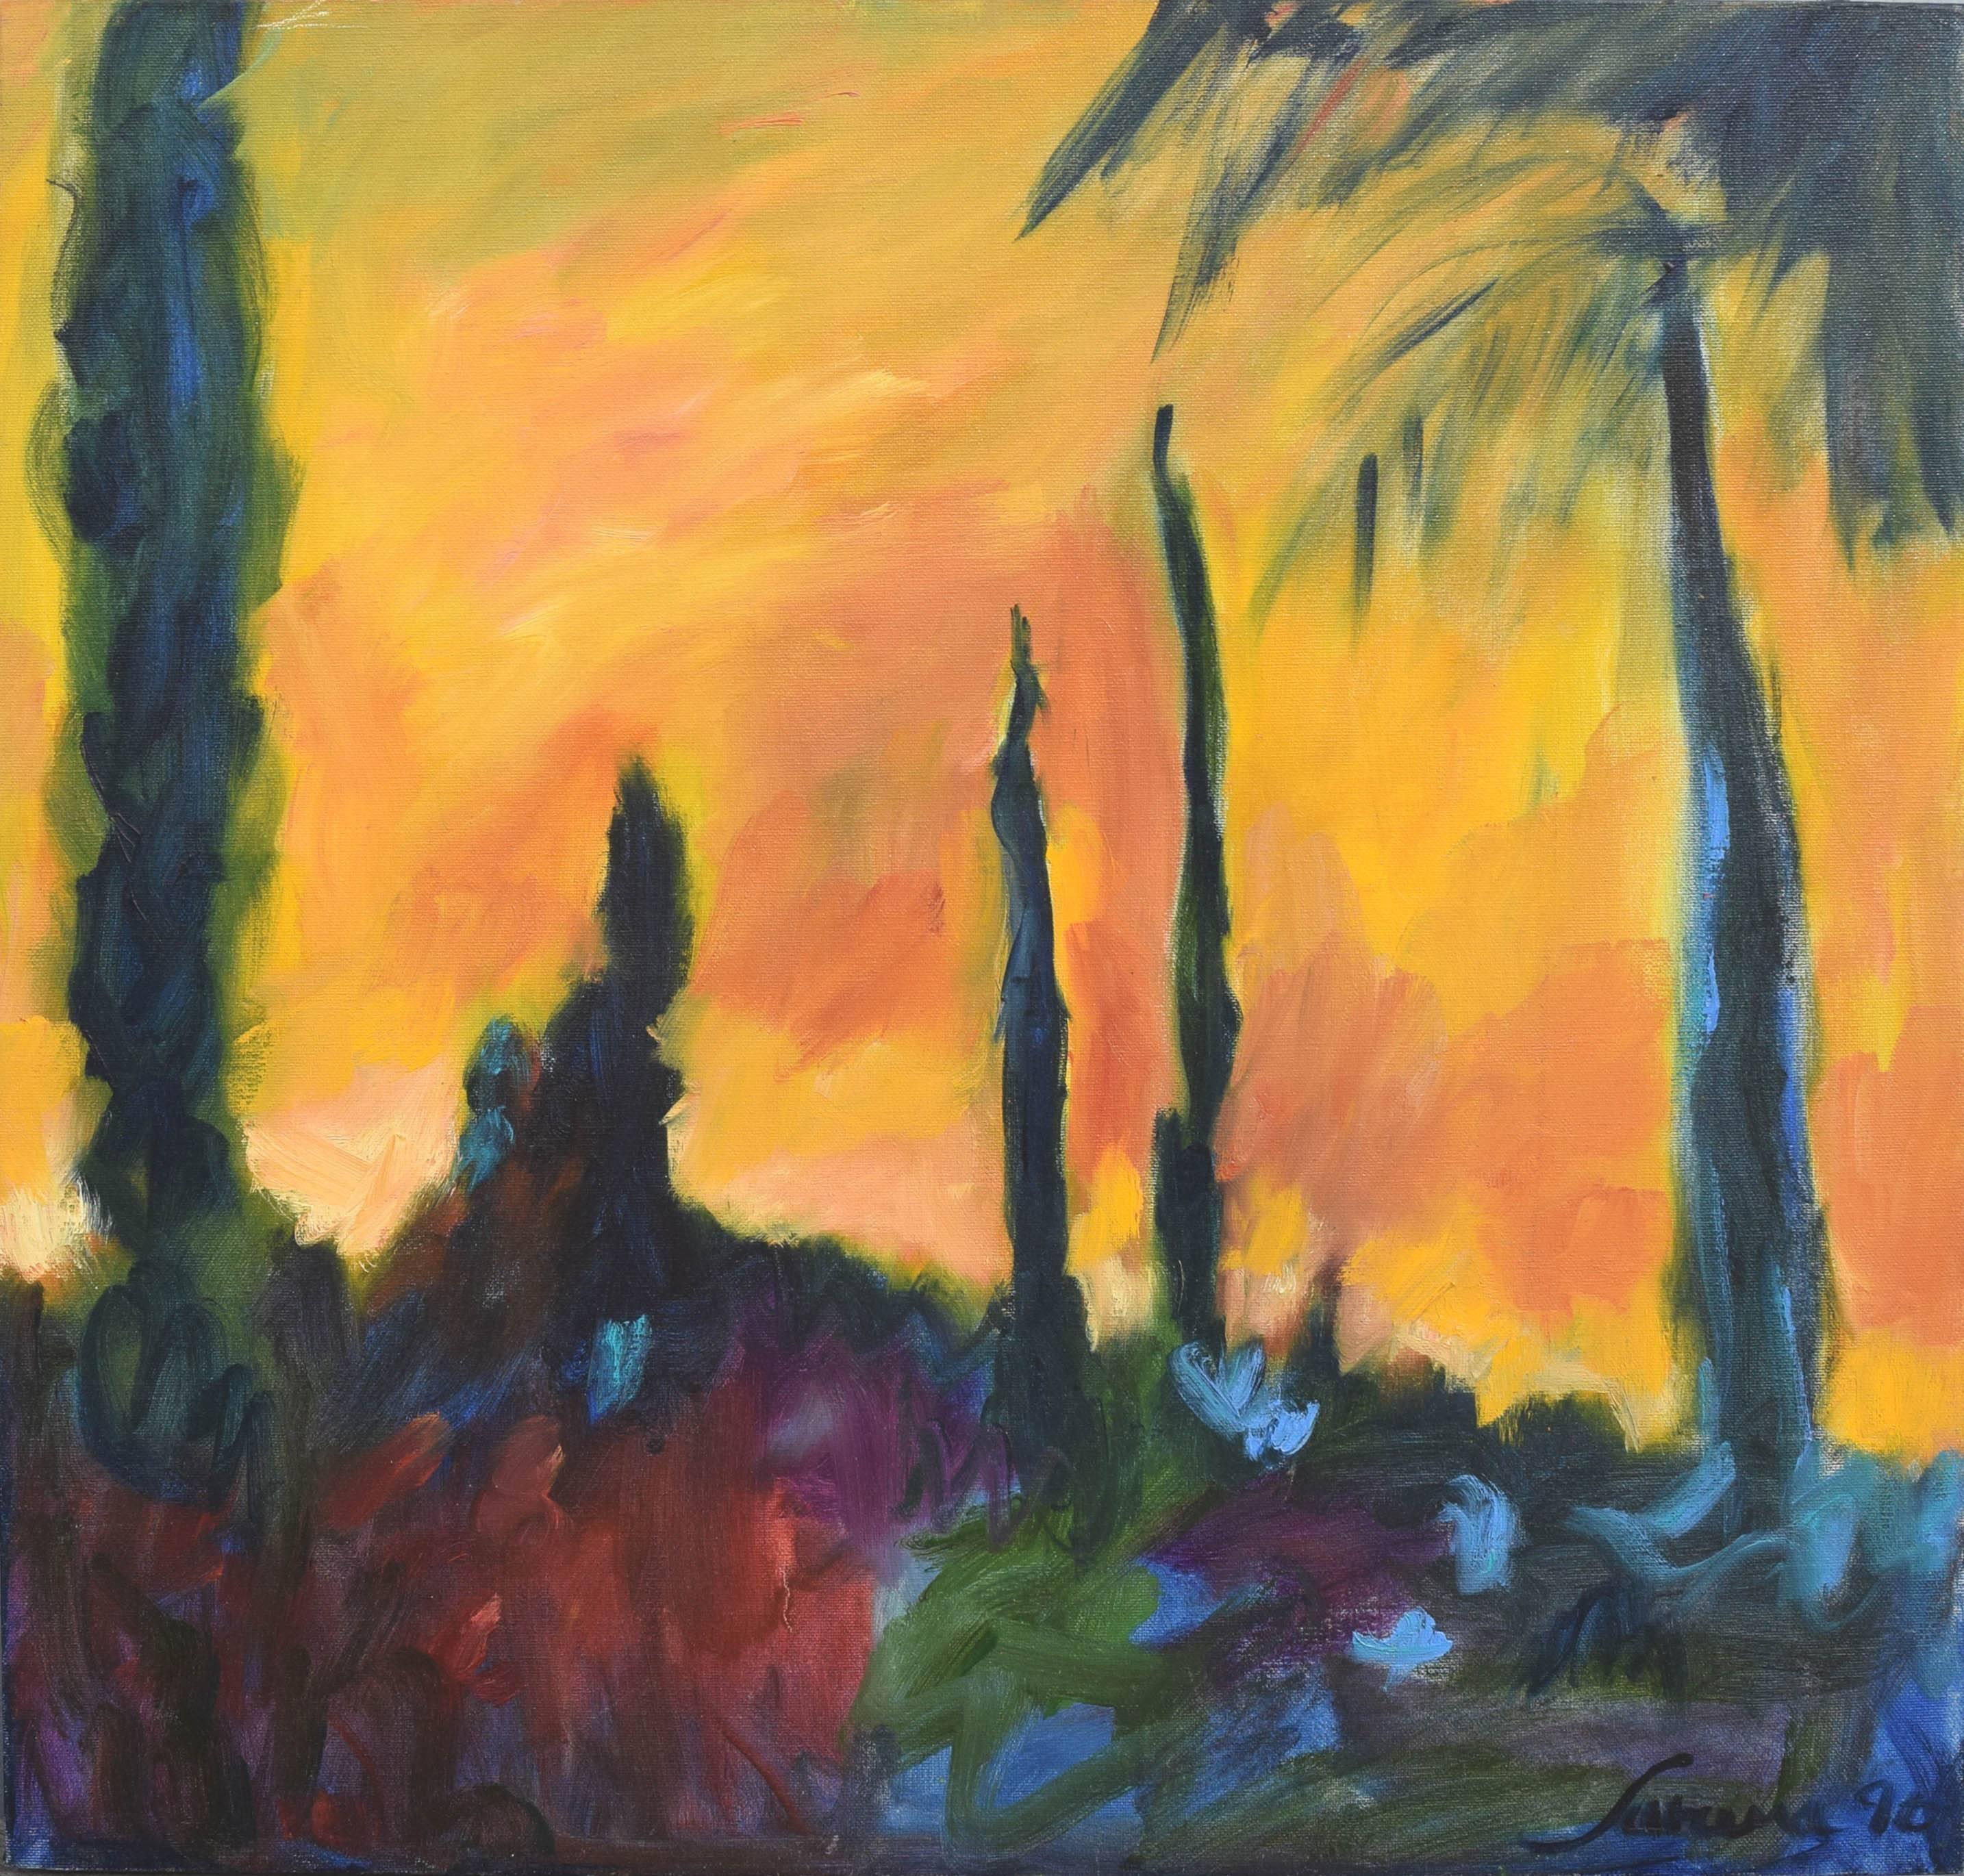 Fauvist Sunset & Cypress Trees